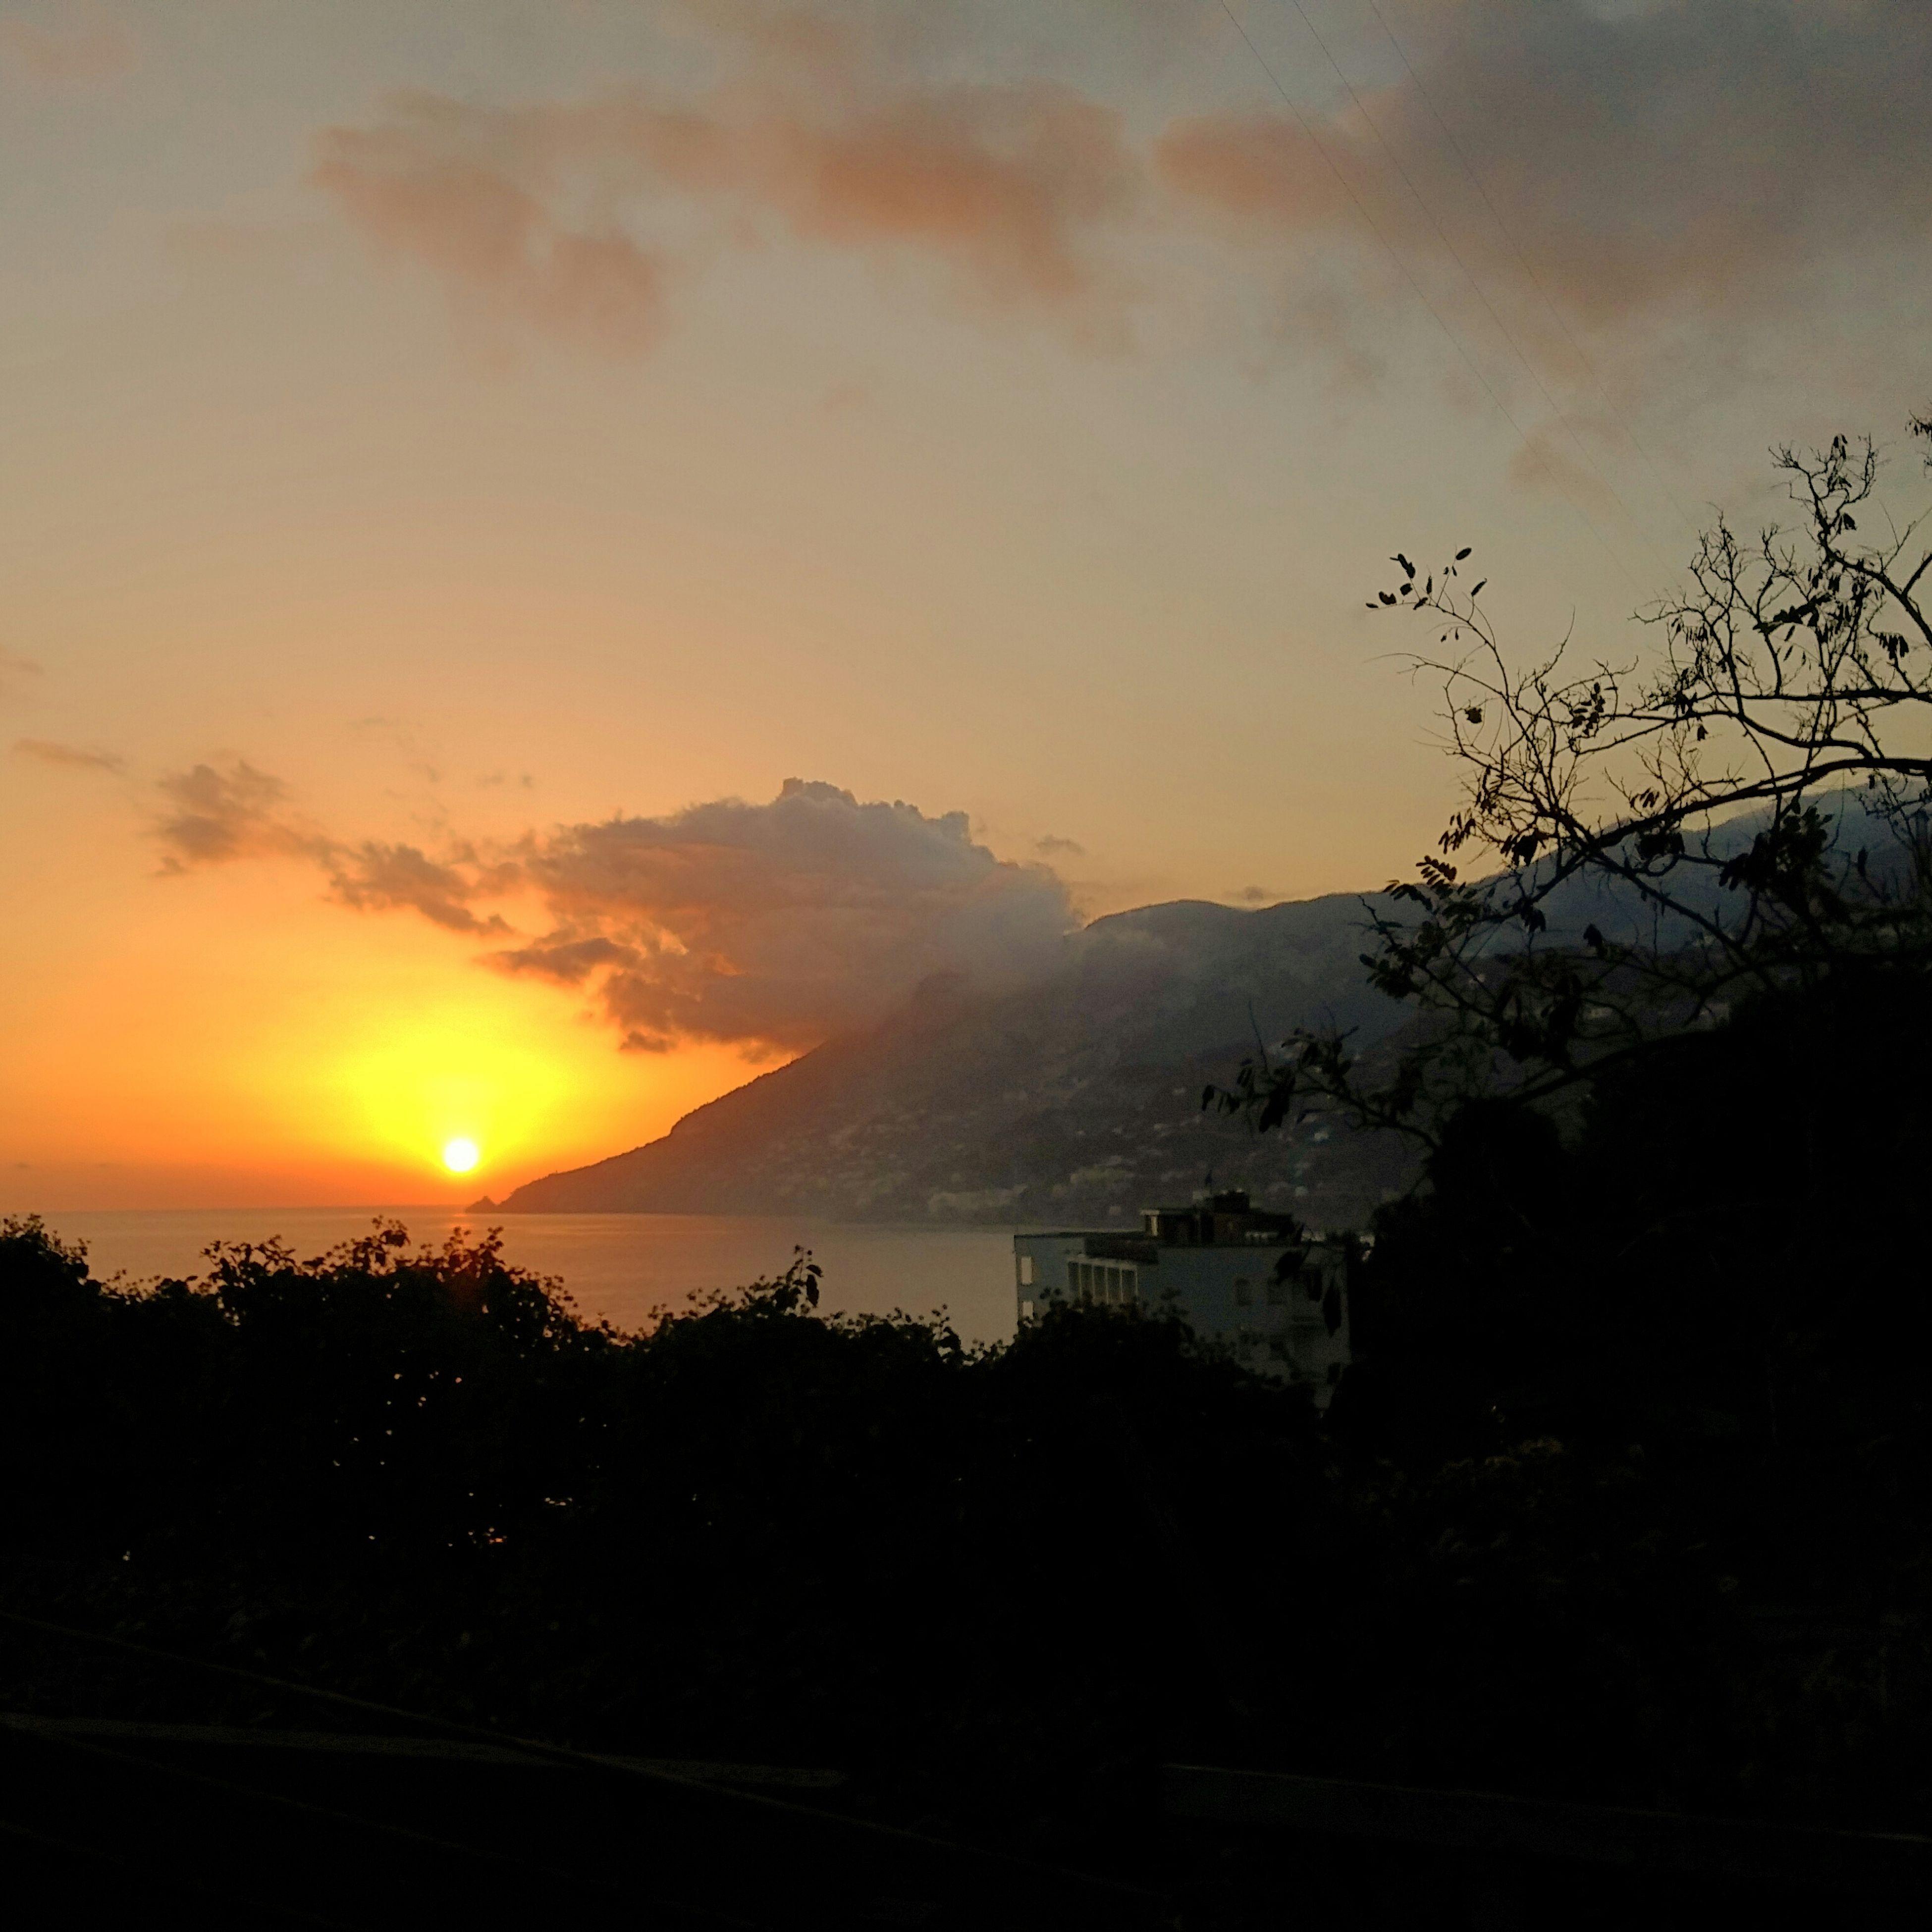 sunset, scenics, silhouette, beauty in nature, sky, tranquil scene, sun, mountain, tranquility, orange color, nature, landscape, idyllic, cloud - sky, sunlight, tree, mountain range, outdoors, non-urban scene, no people